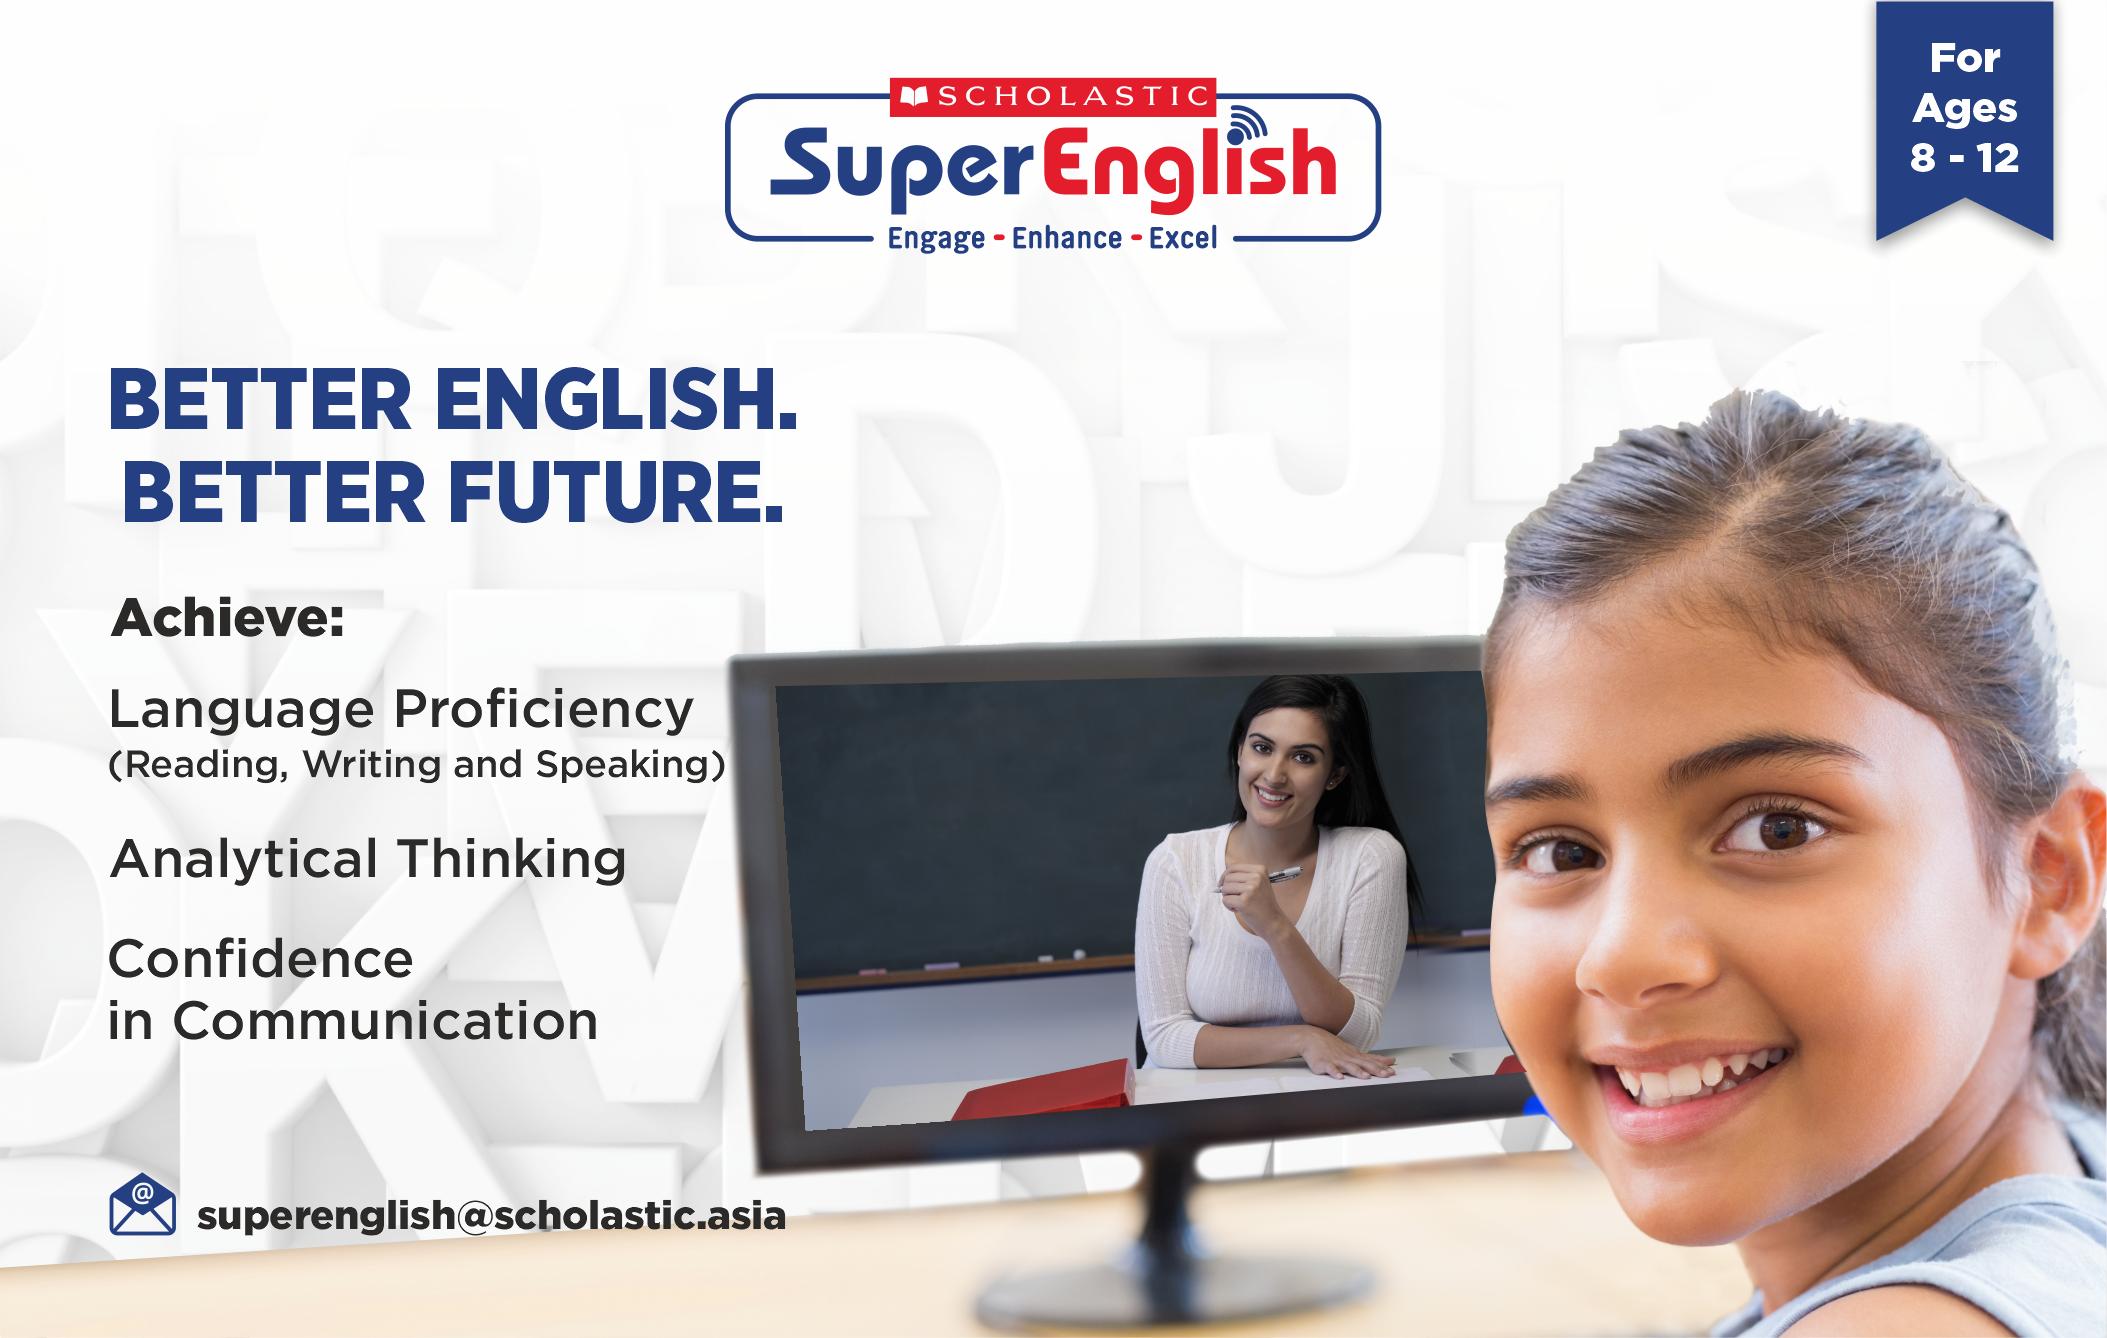 Scholastic Super English